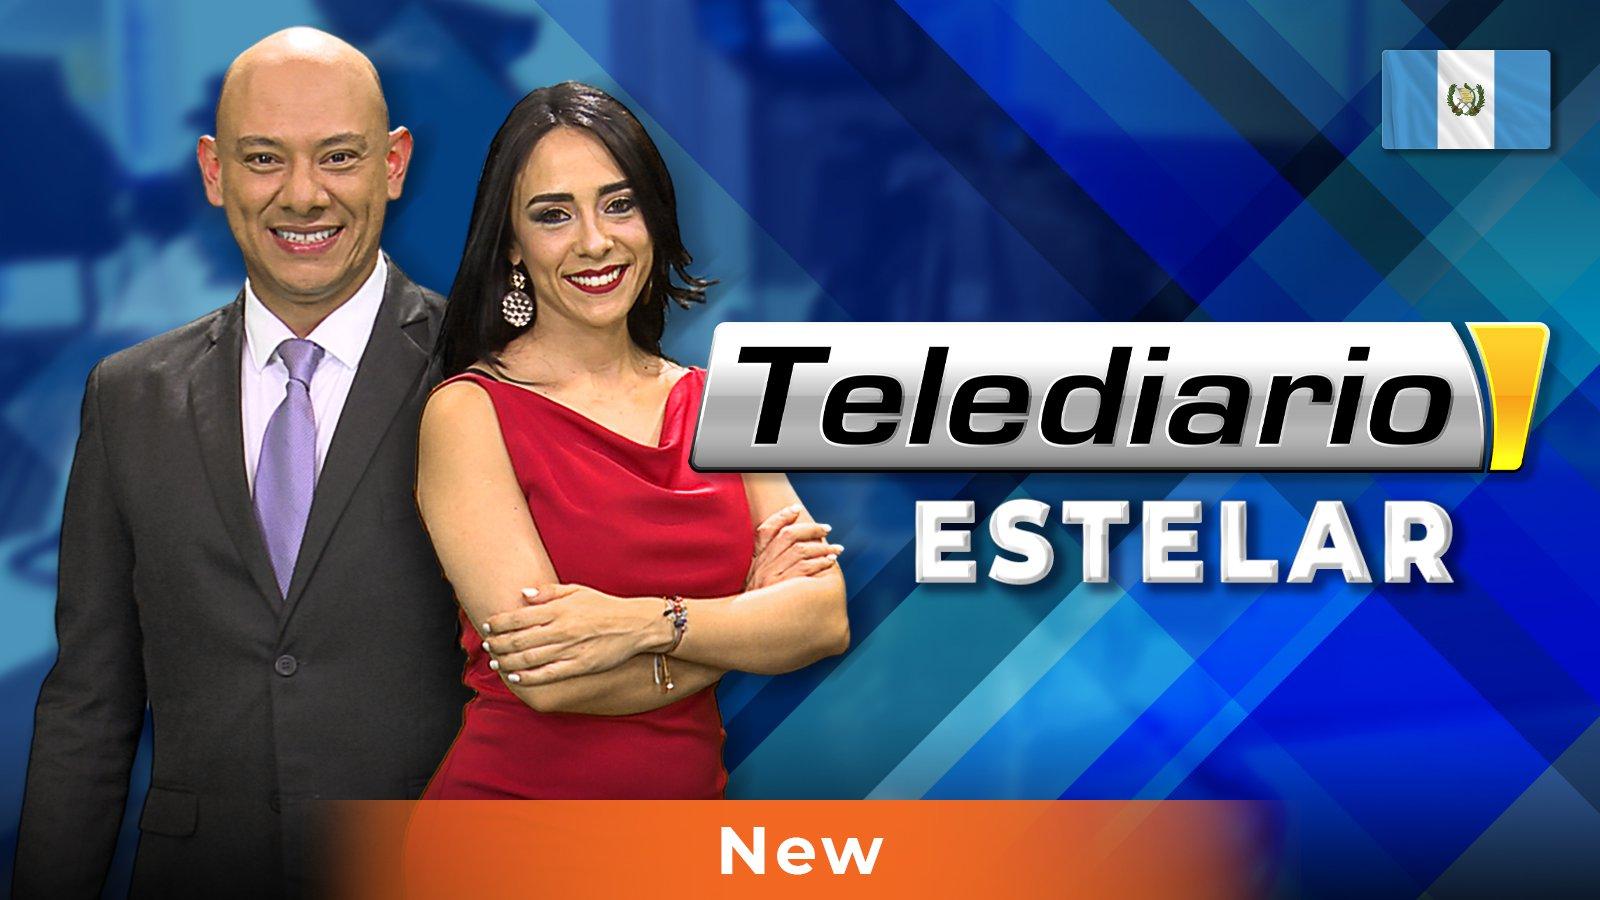 Telediario Estelar poster